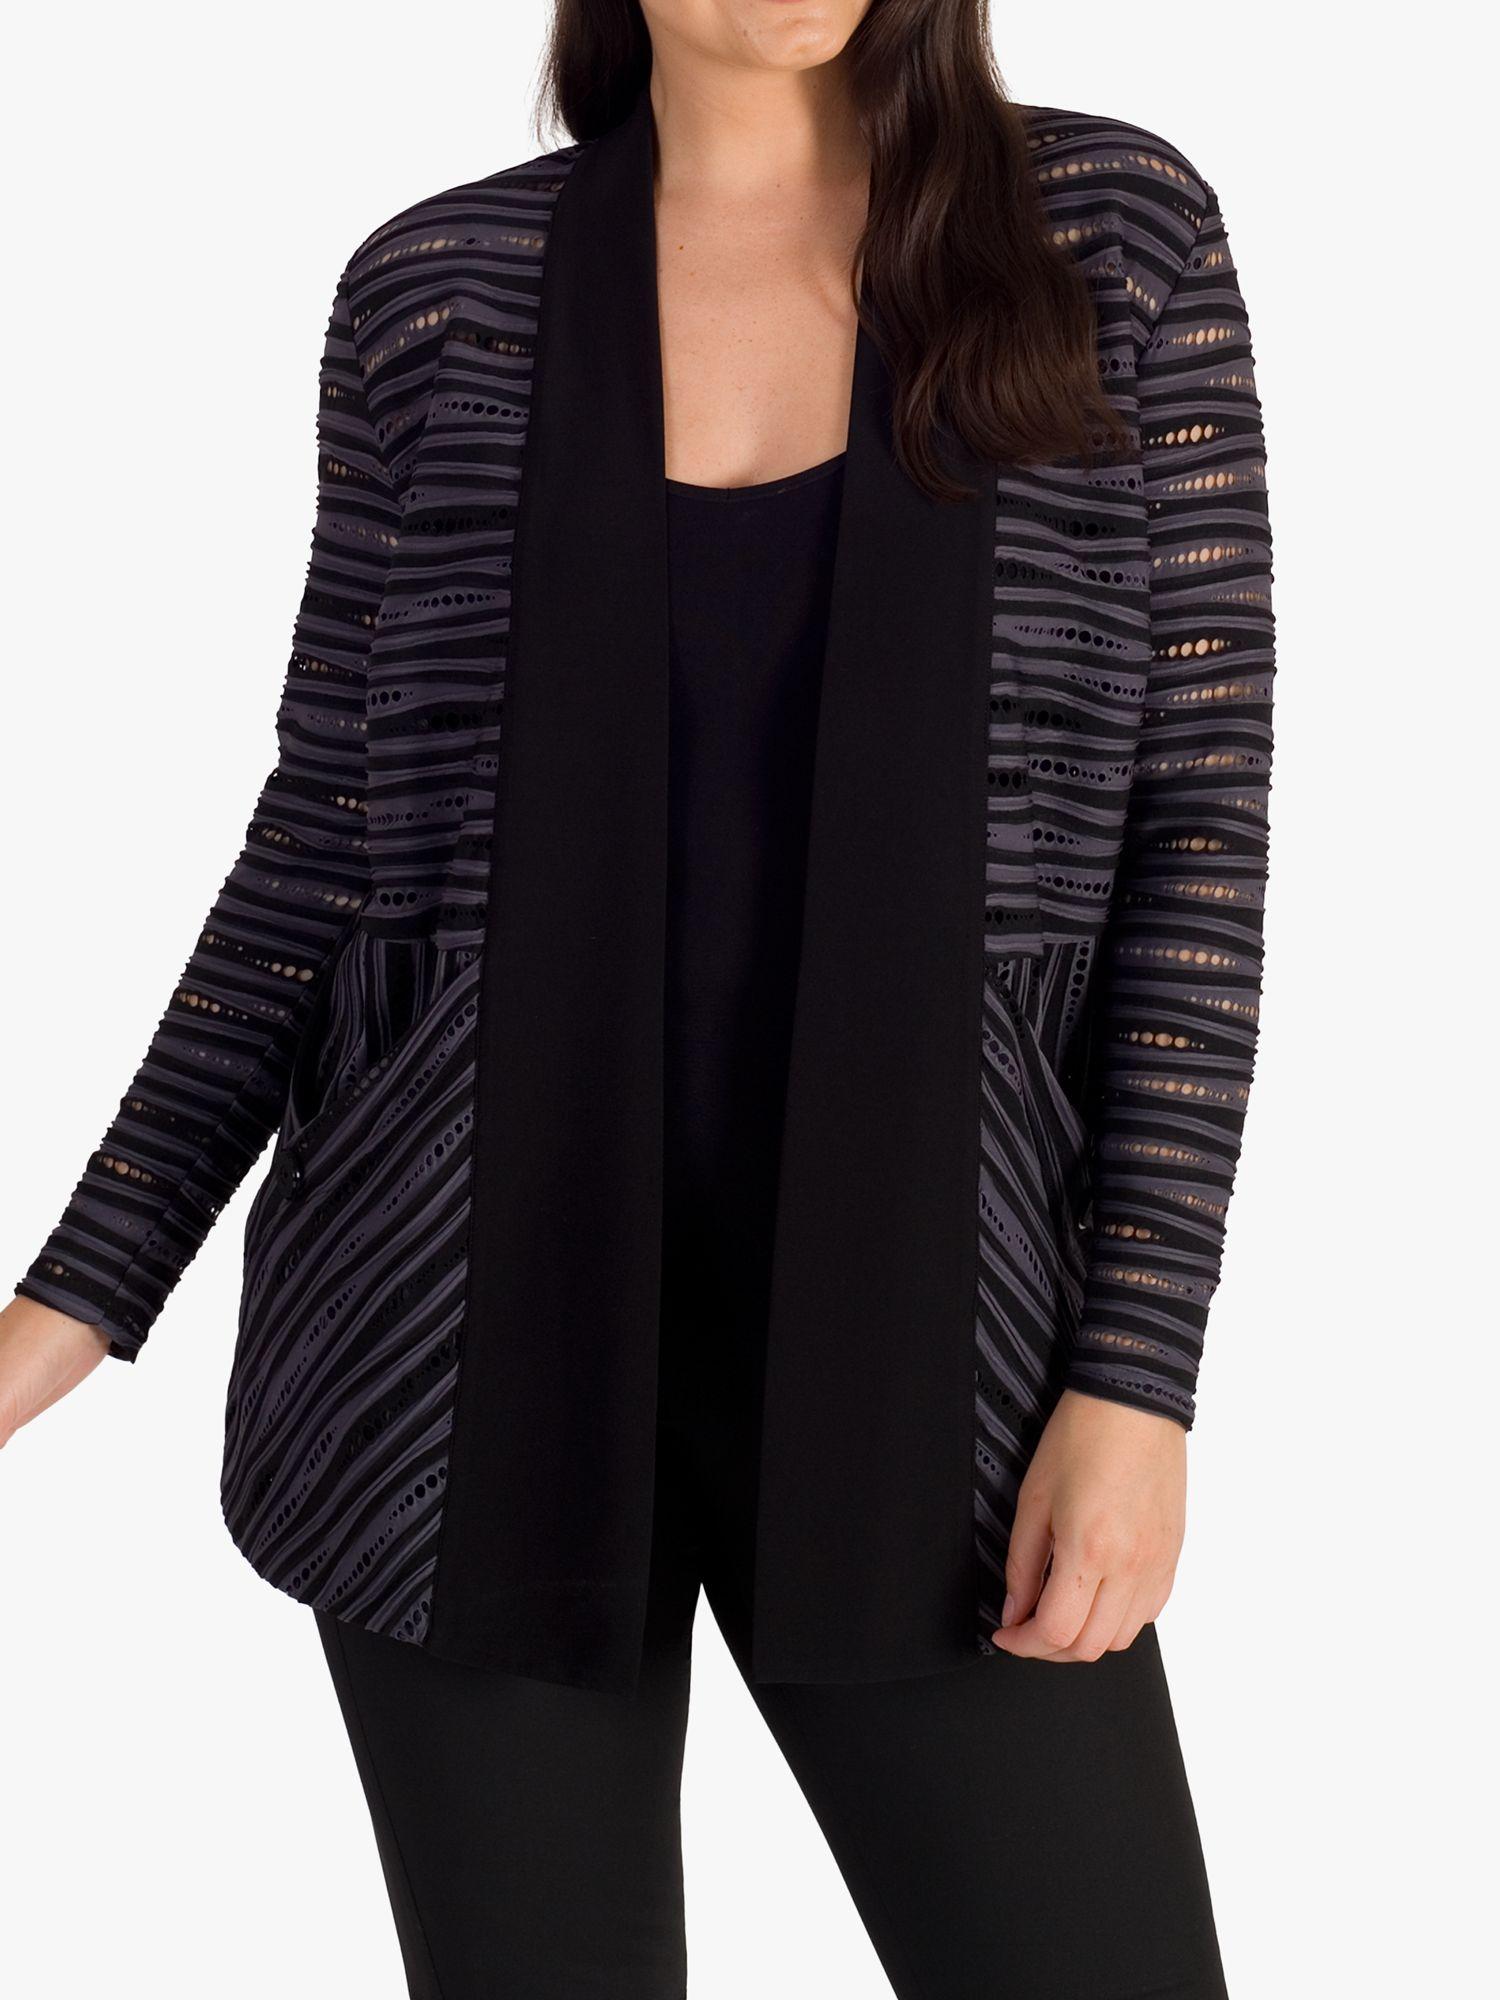 Chesca chesca Ribbed Stripe Jersey Jacket, Grey/Black